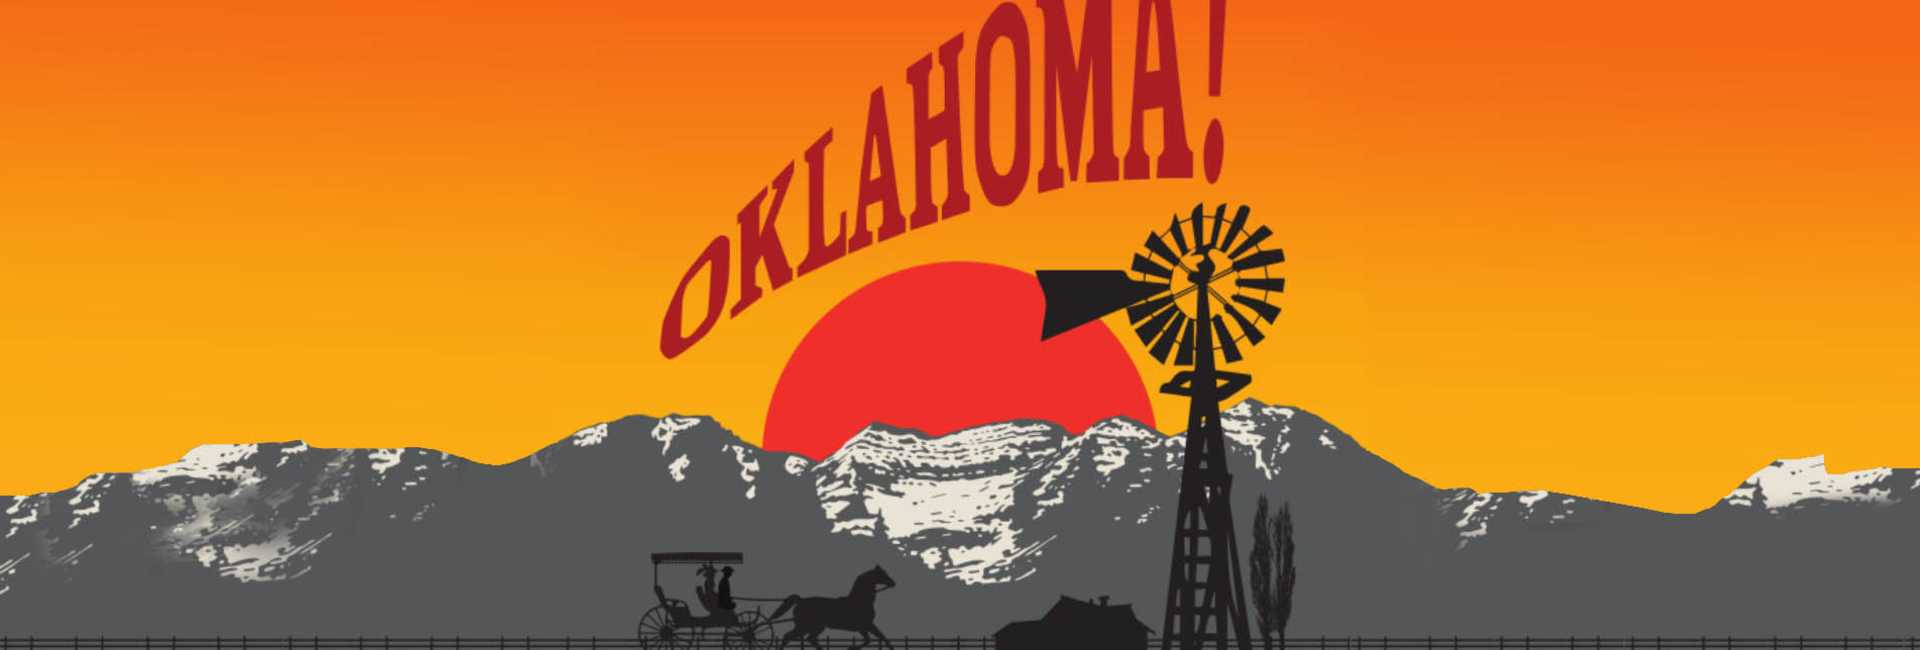 Sundance Oklahoma